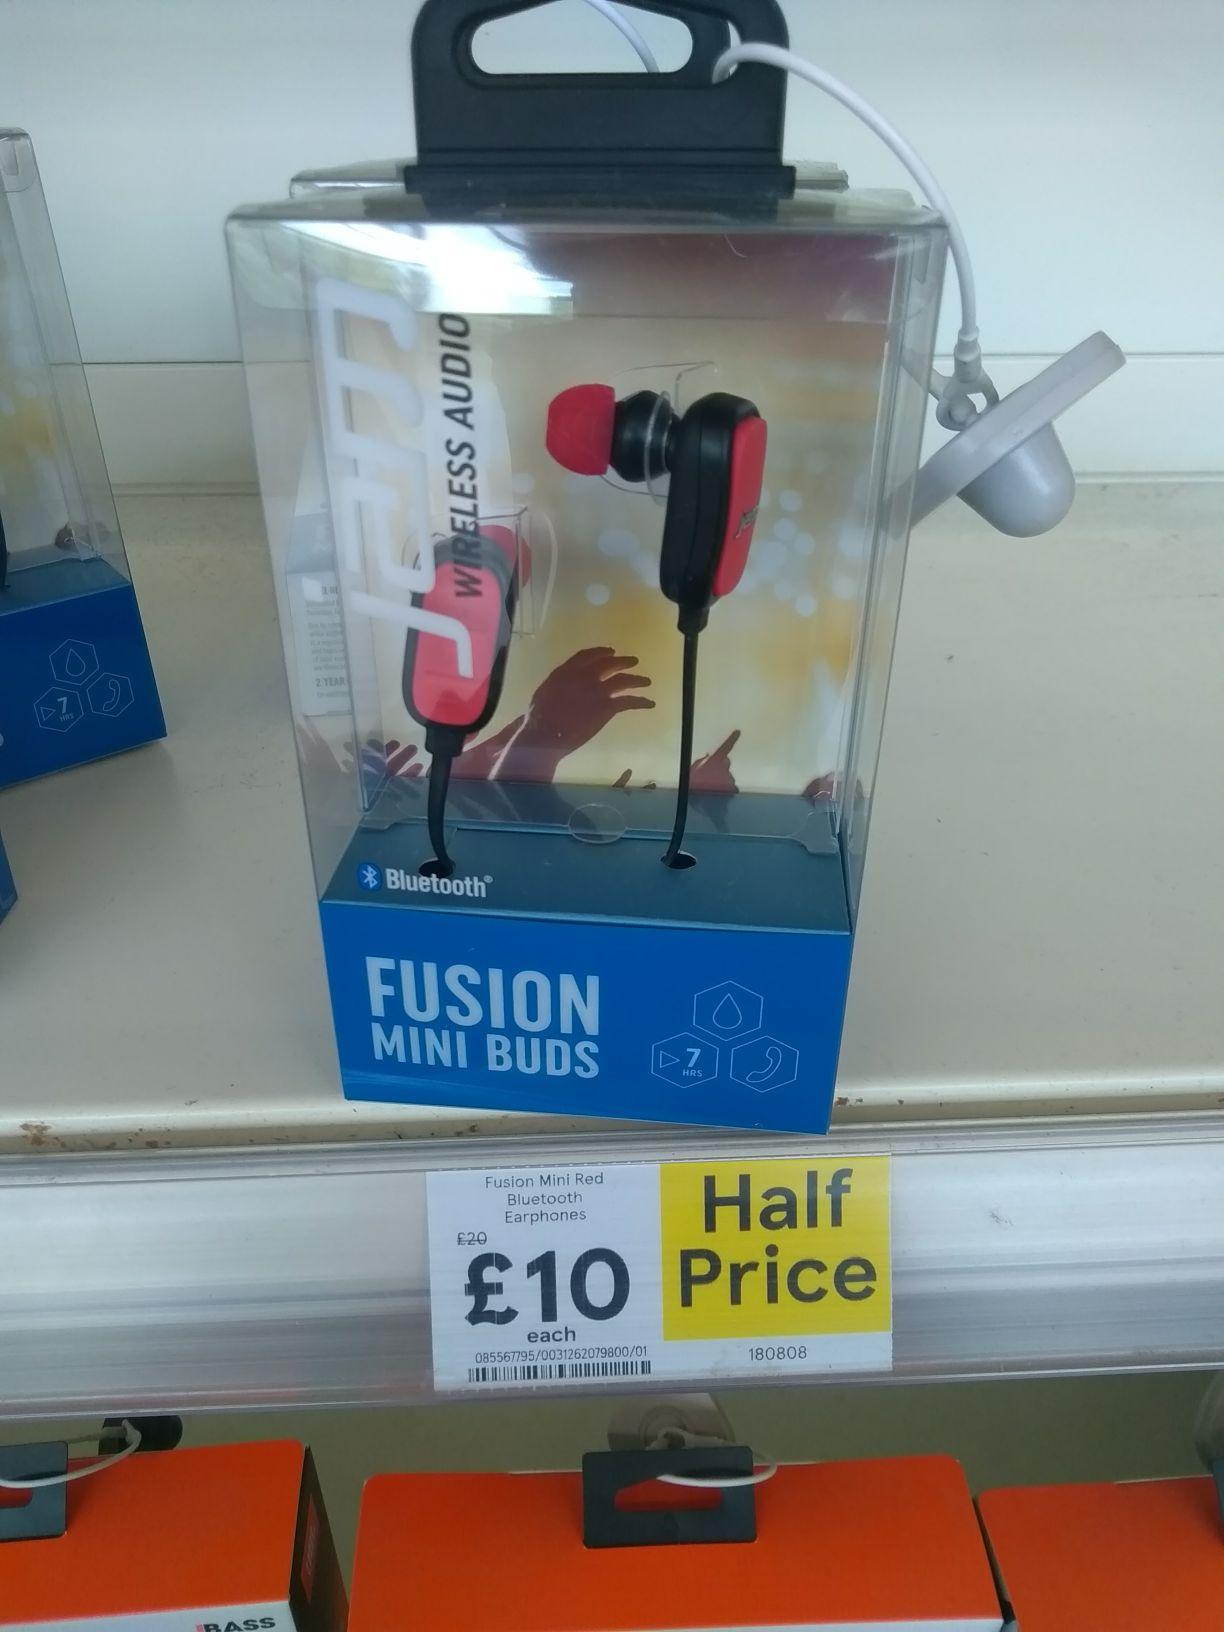 Jam Fusion Bluetooth headphones instore at Tesco (Pontardawe) for £10